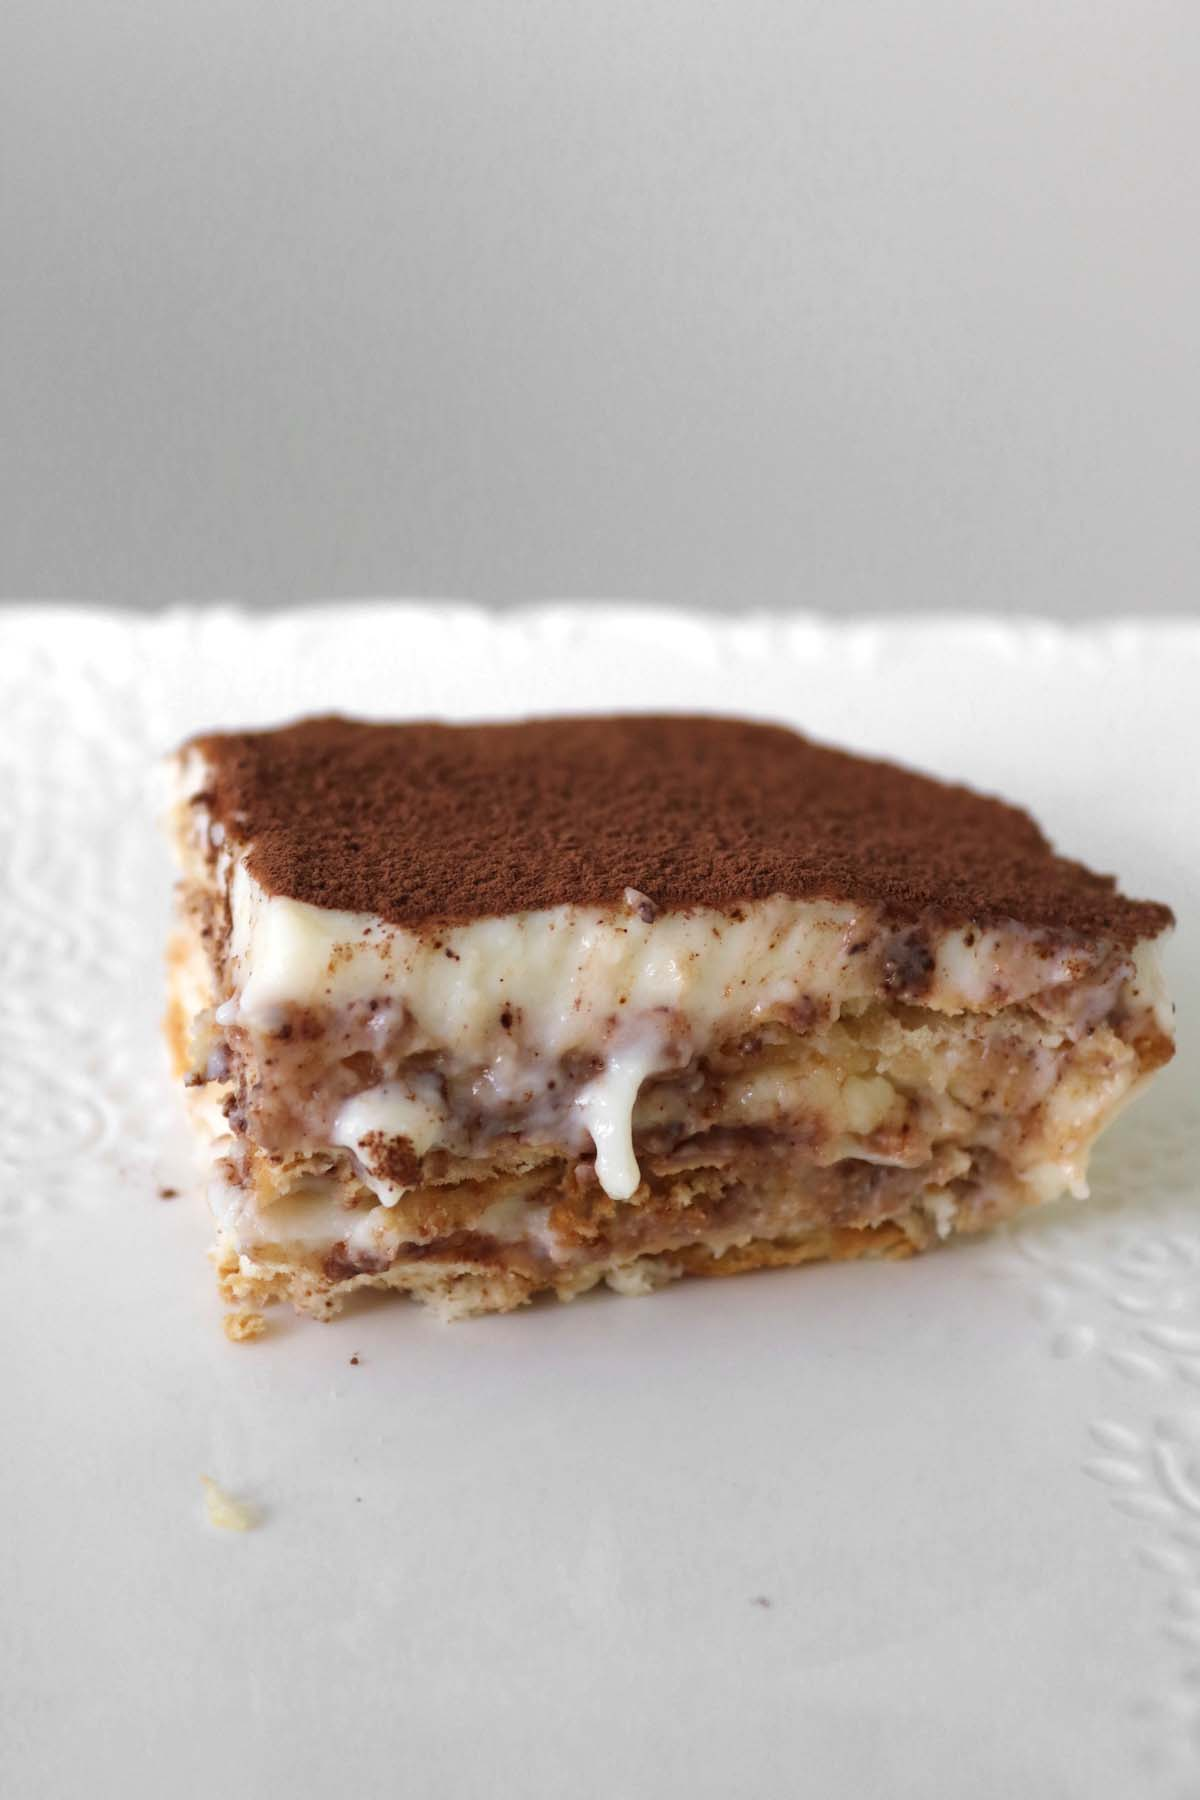 side view of custard cake